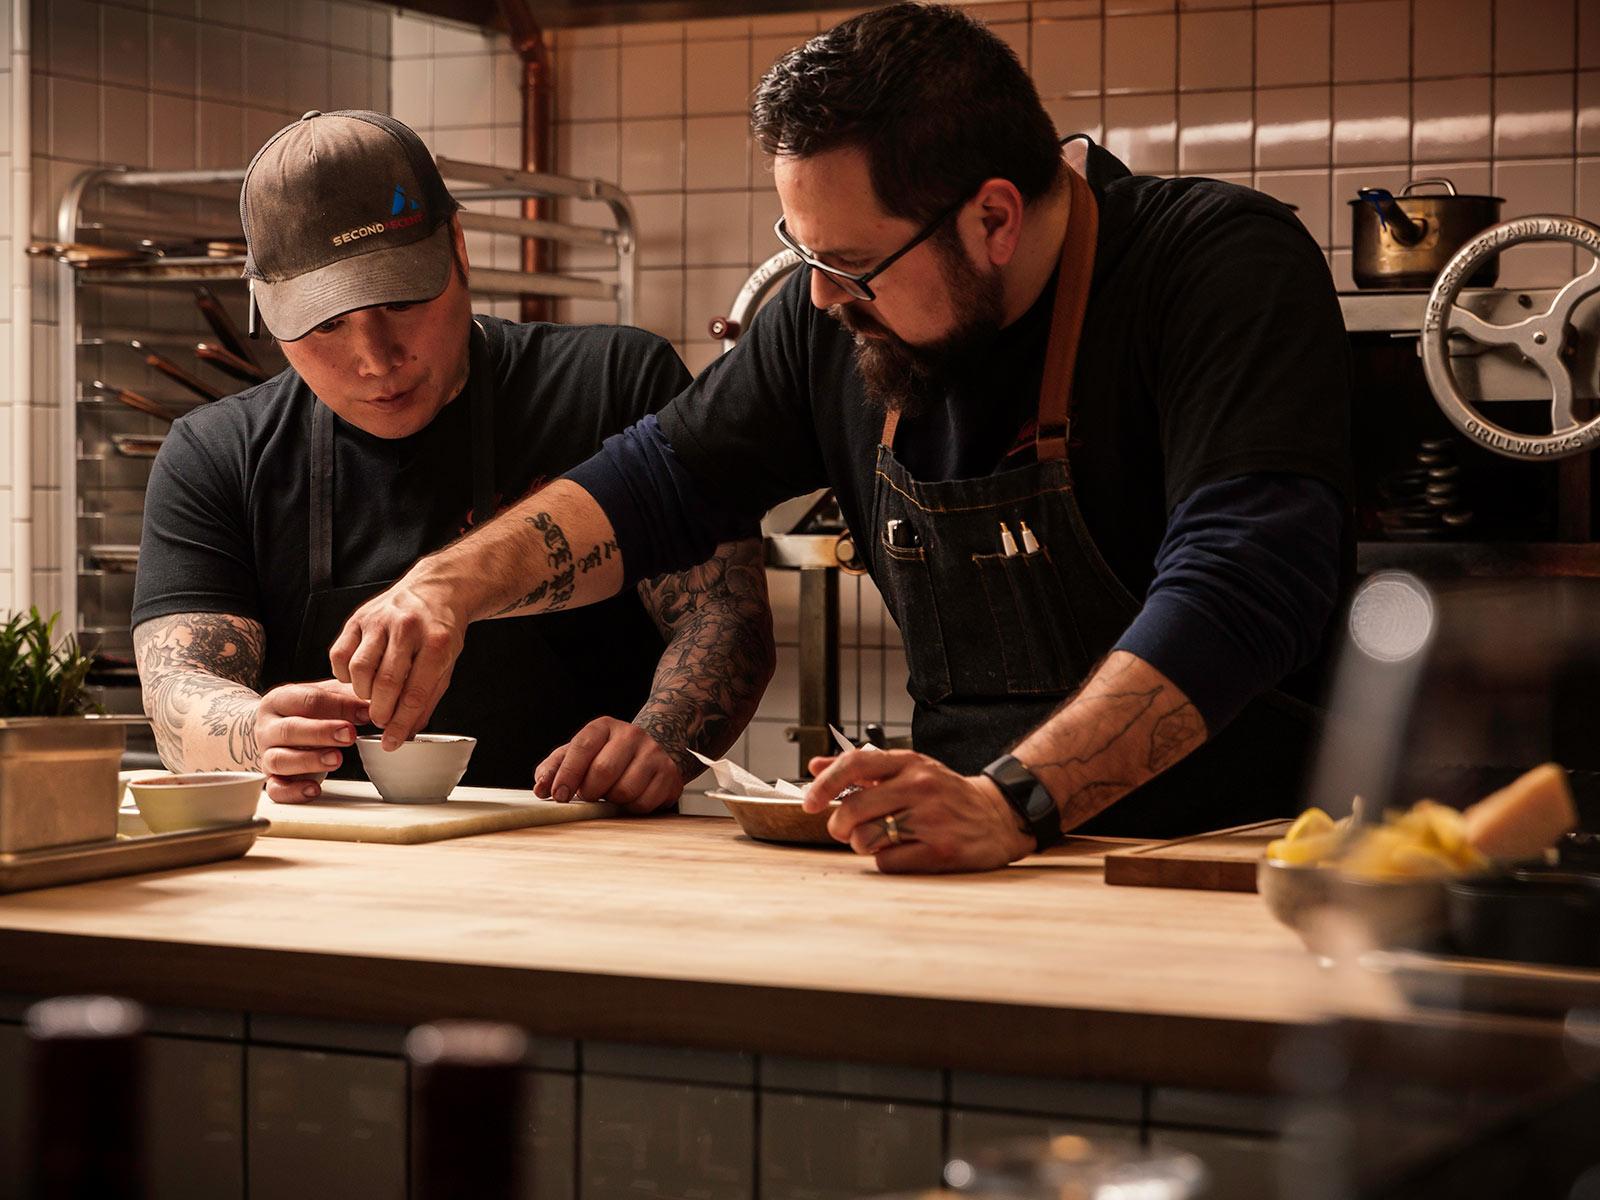 Chefs at Glorietta Trattoria in Jackson Hole